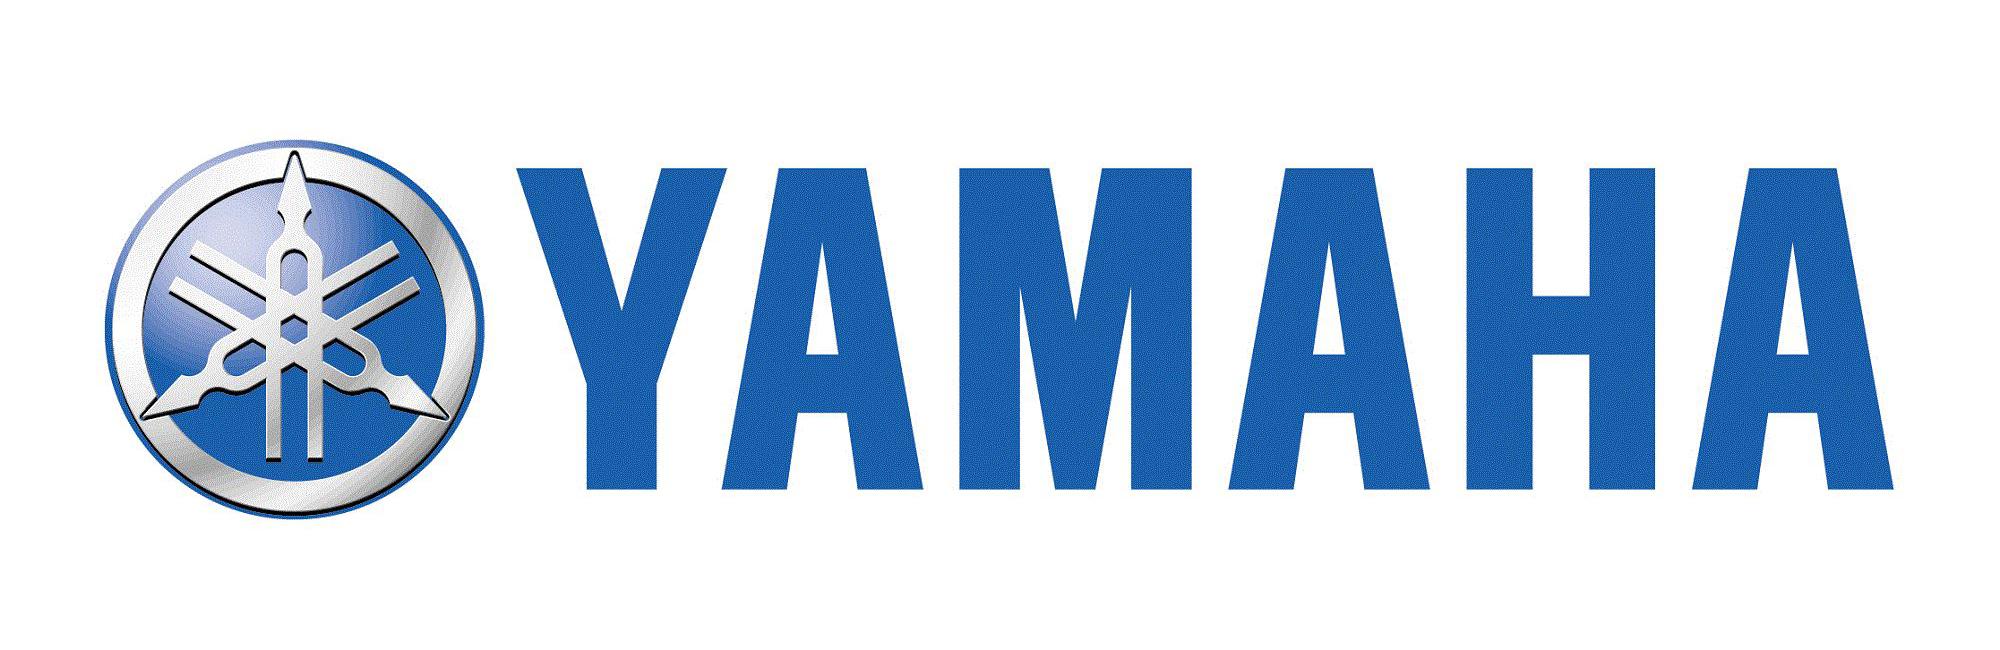 Yamaha Out Board